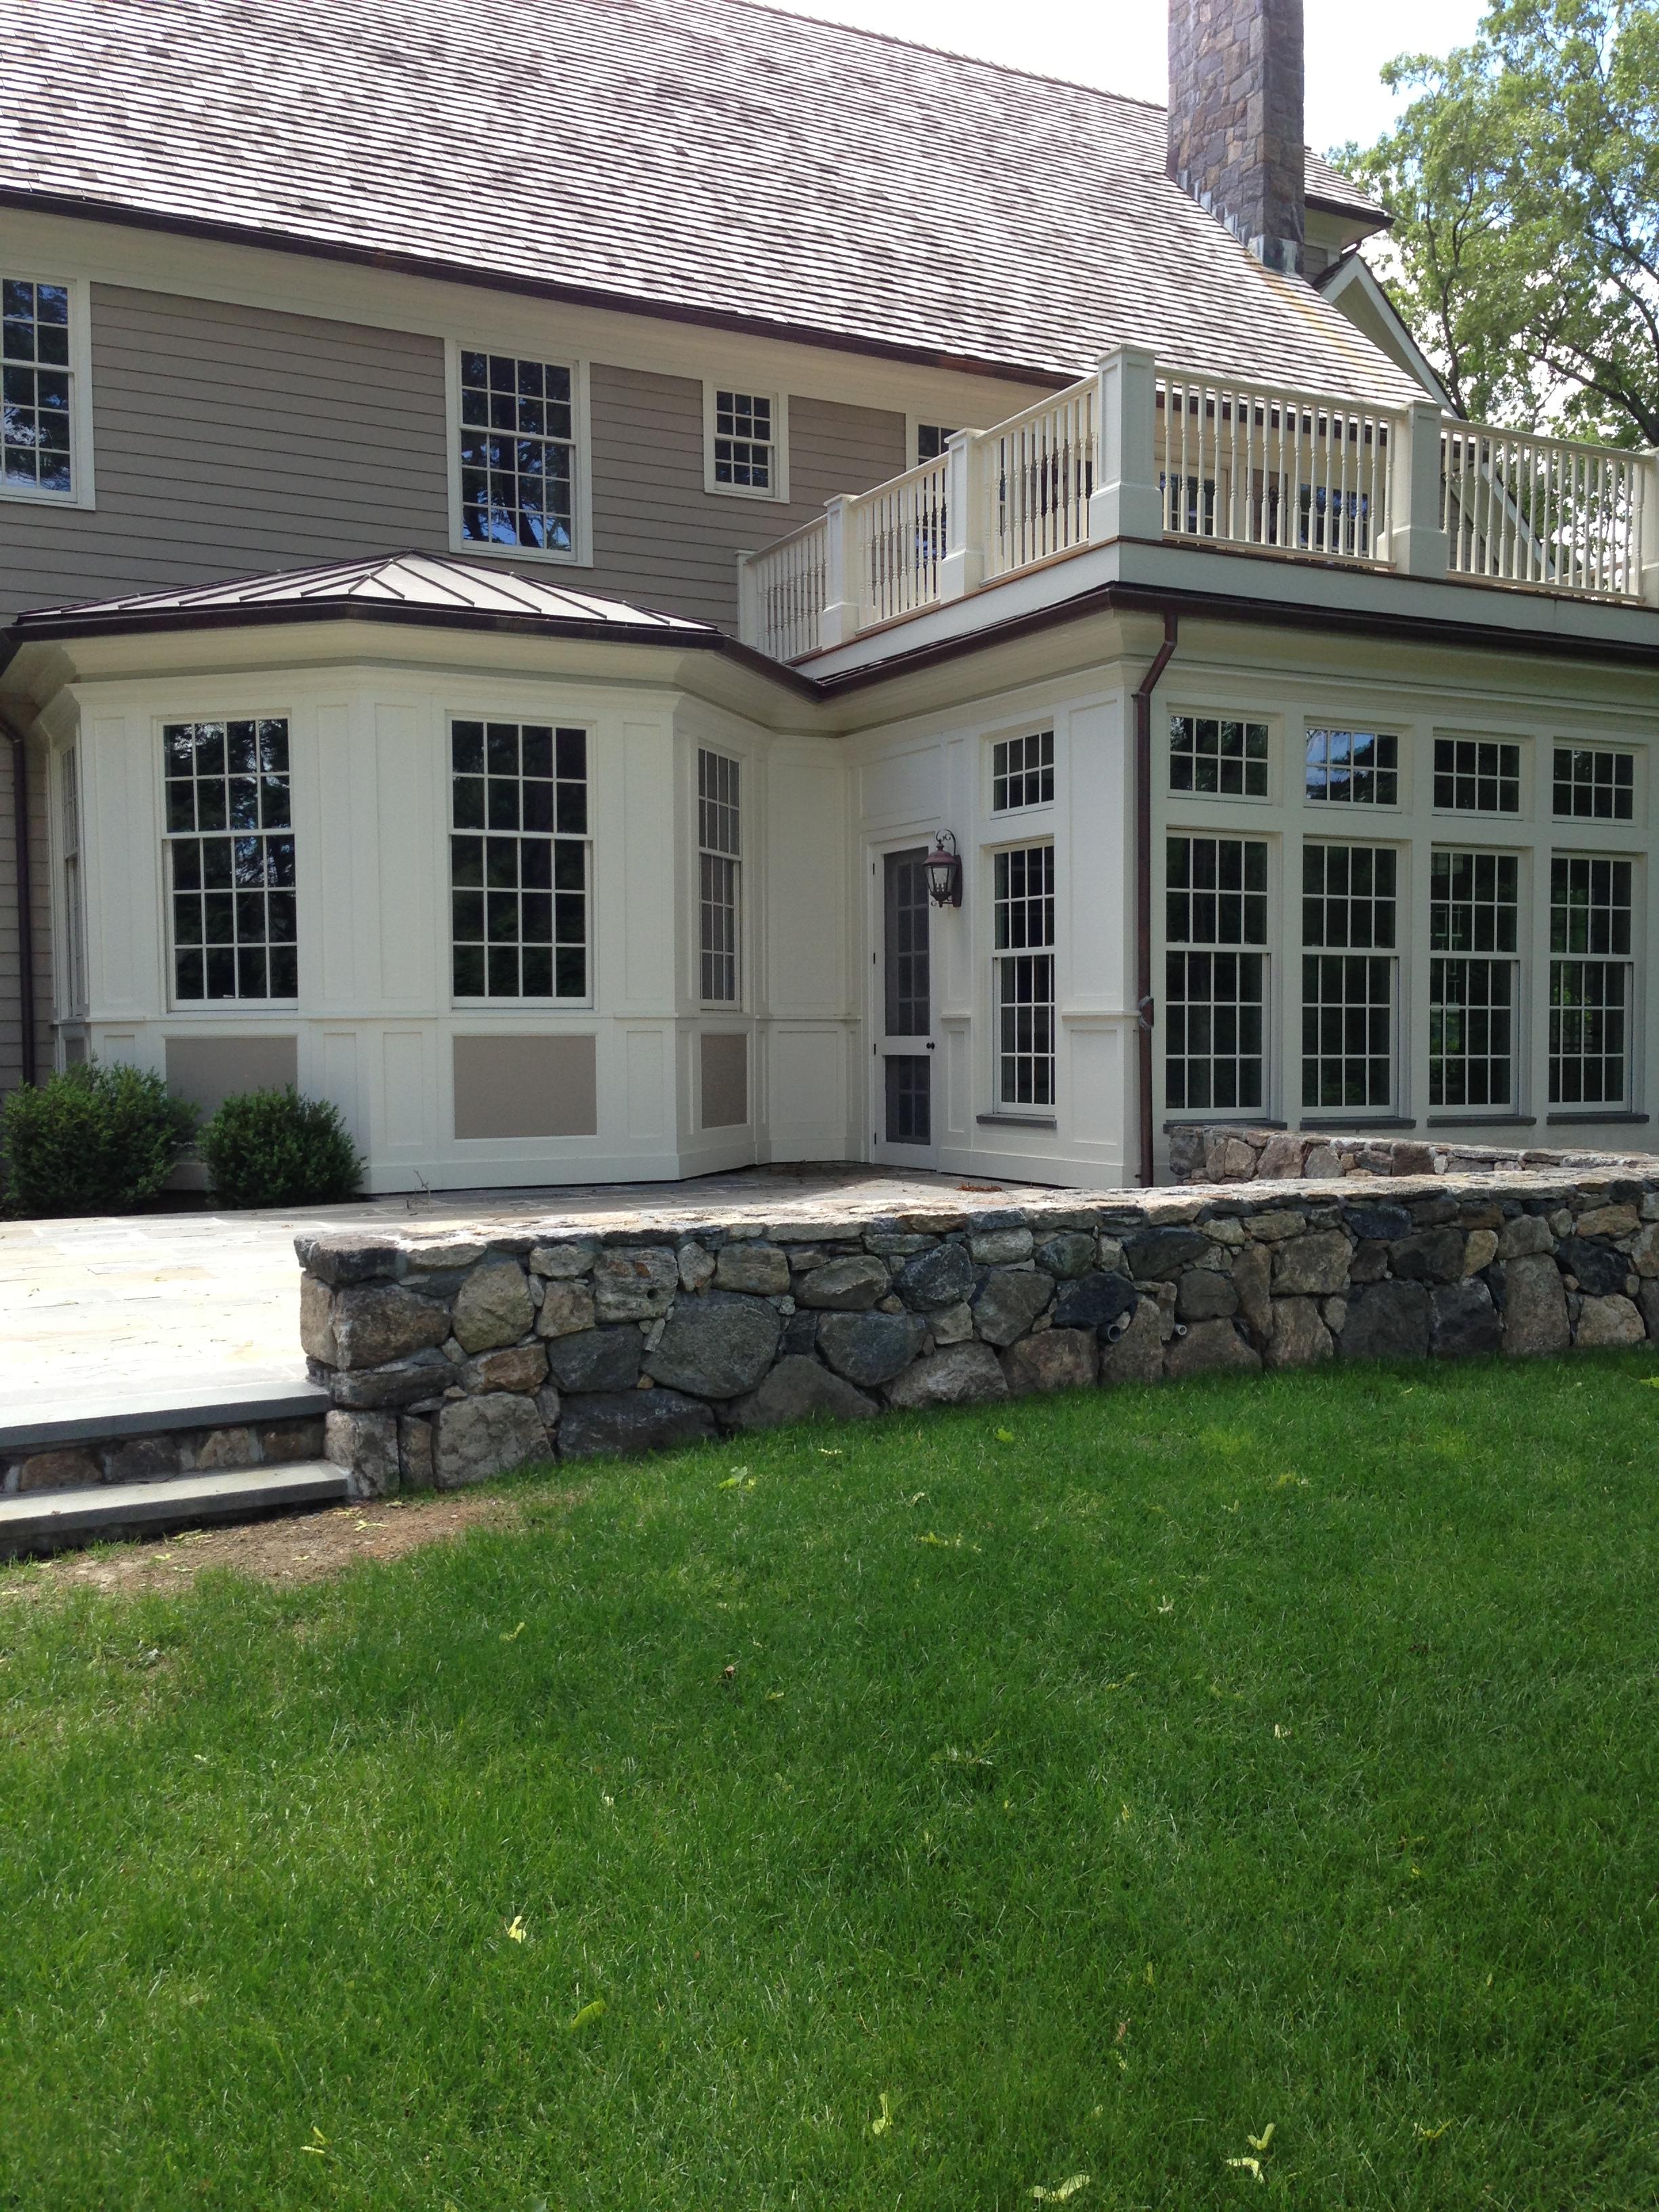 6 Sunroom And Deck Fairfield County Construction